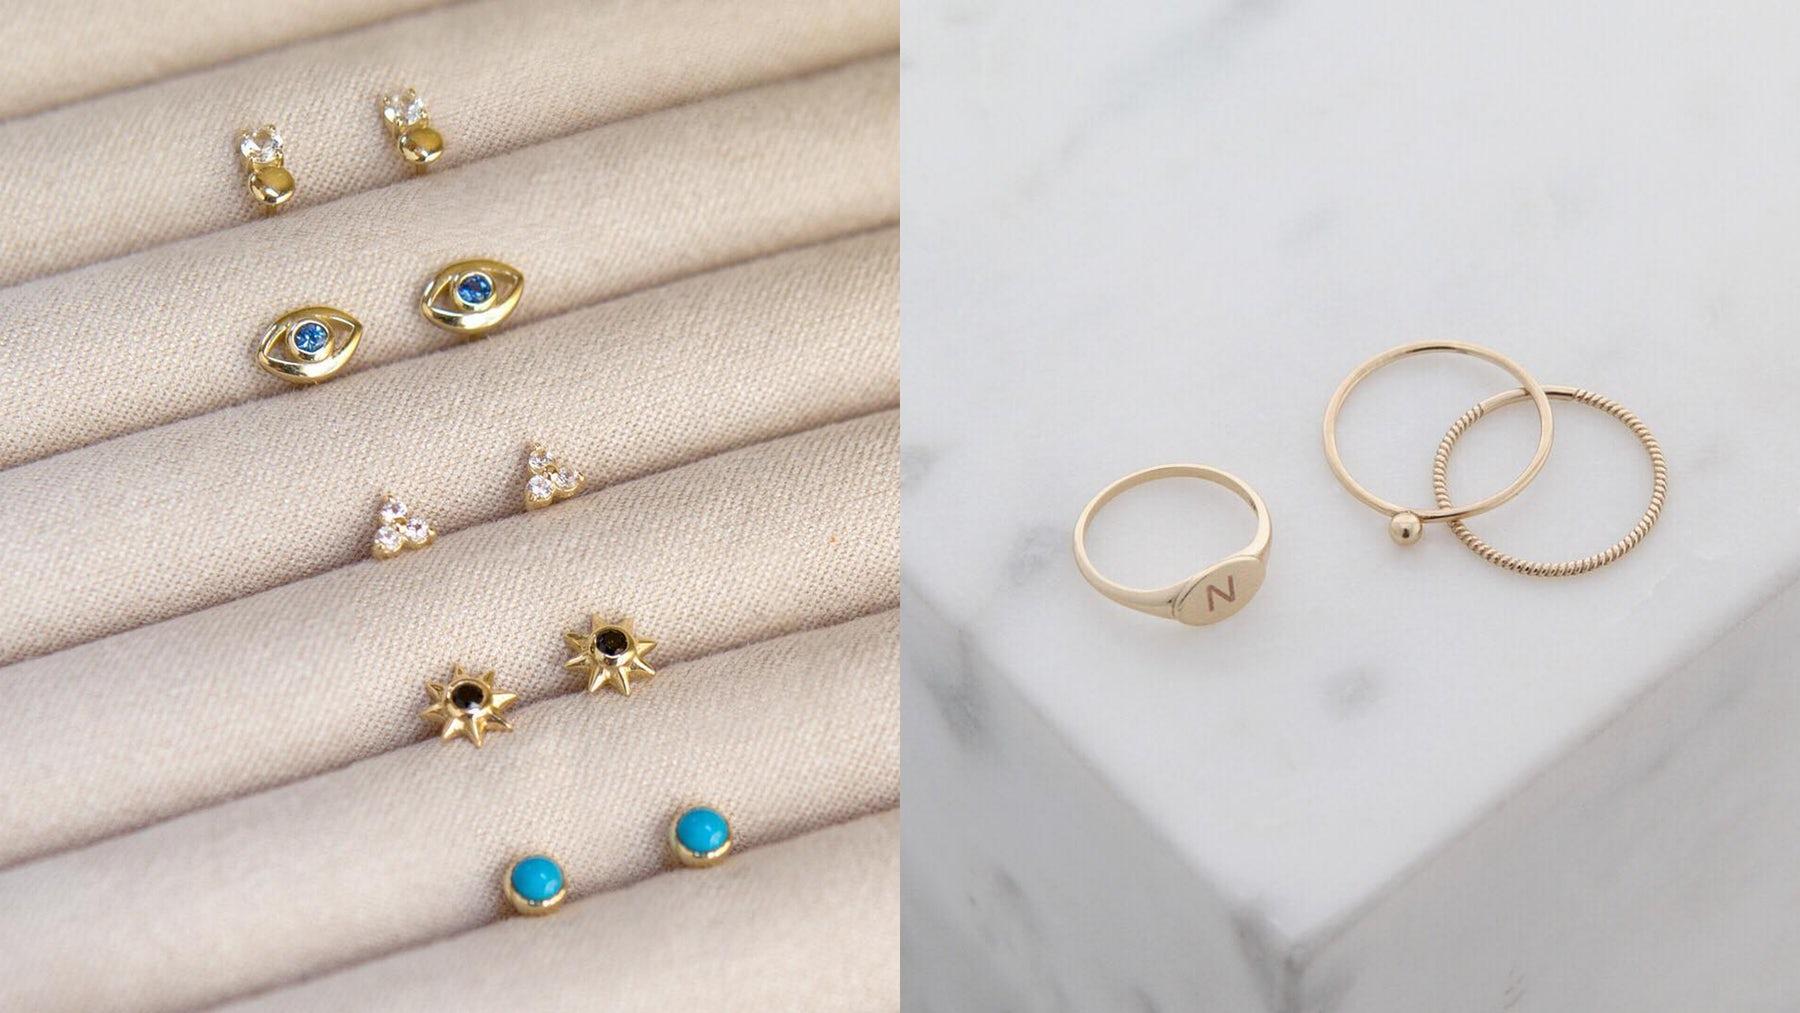 Mejuri jewellery | Source: Courtesy